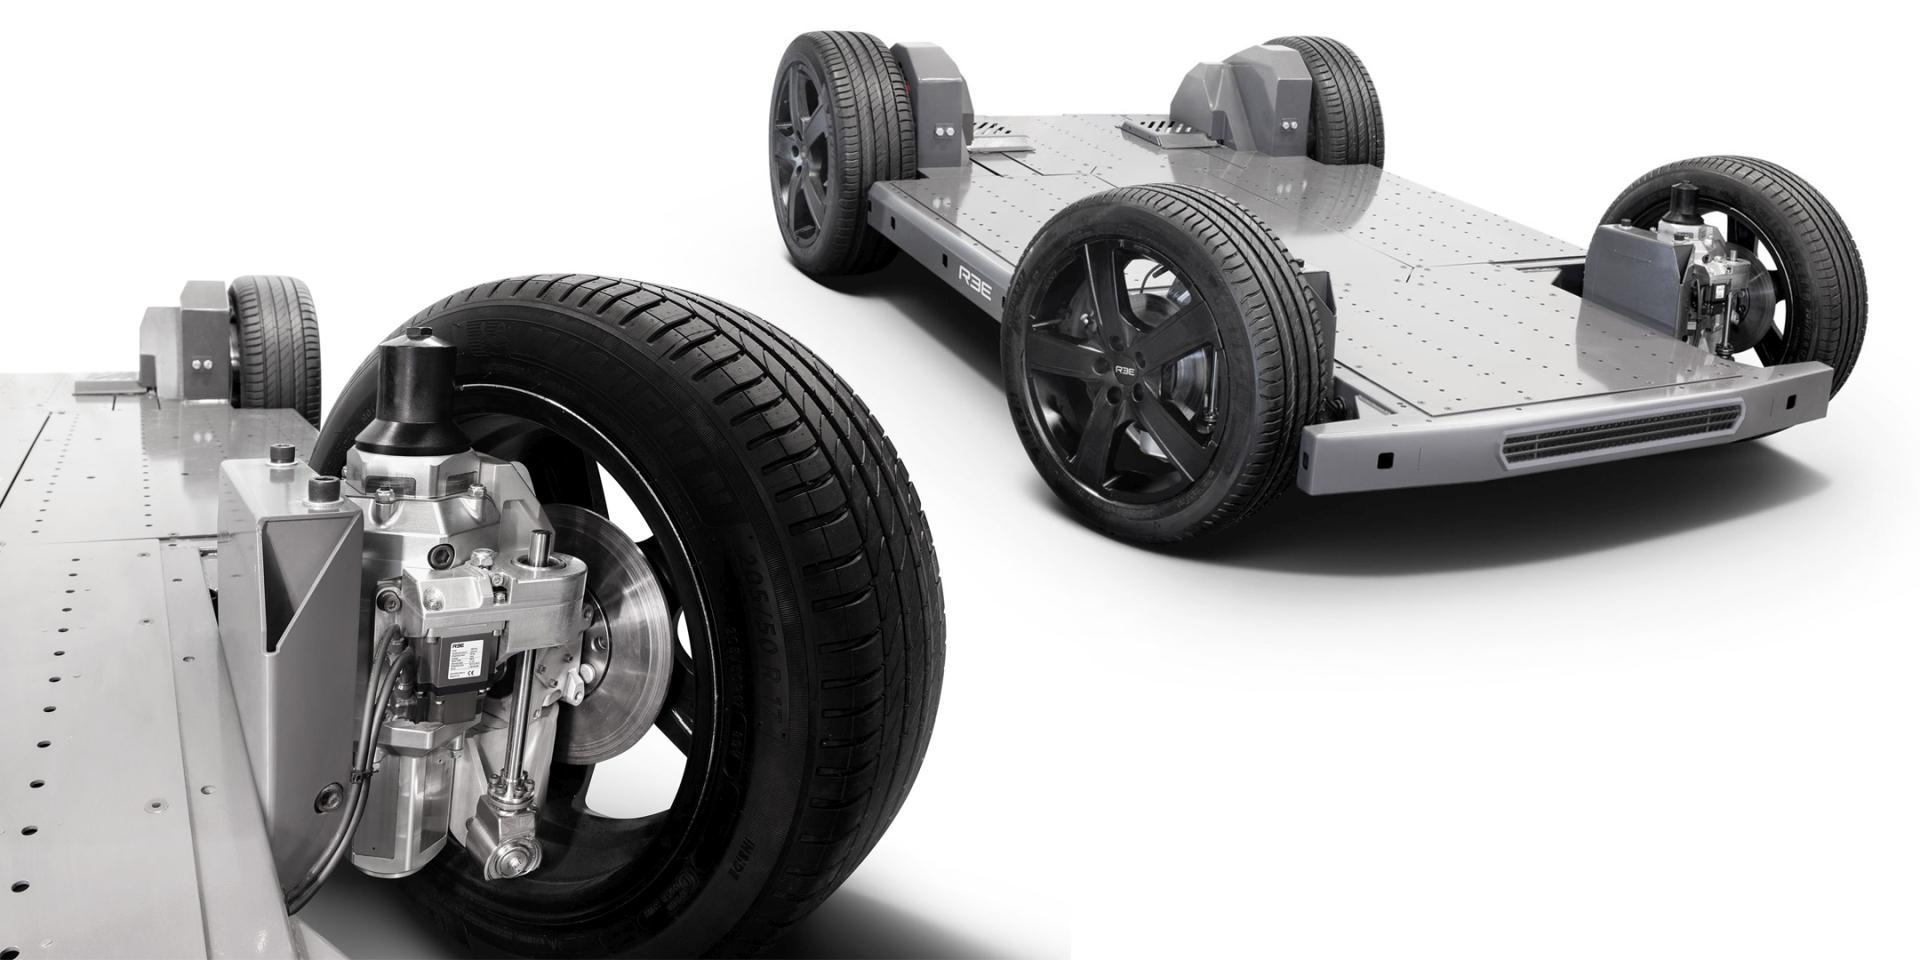 REEcorner technology and fully flat EV platform. Image courtesy of REE Corner